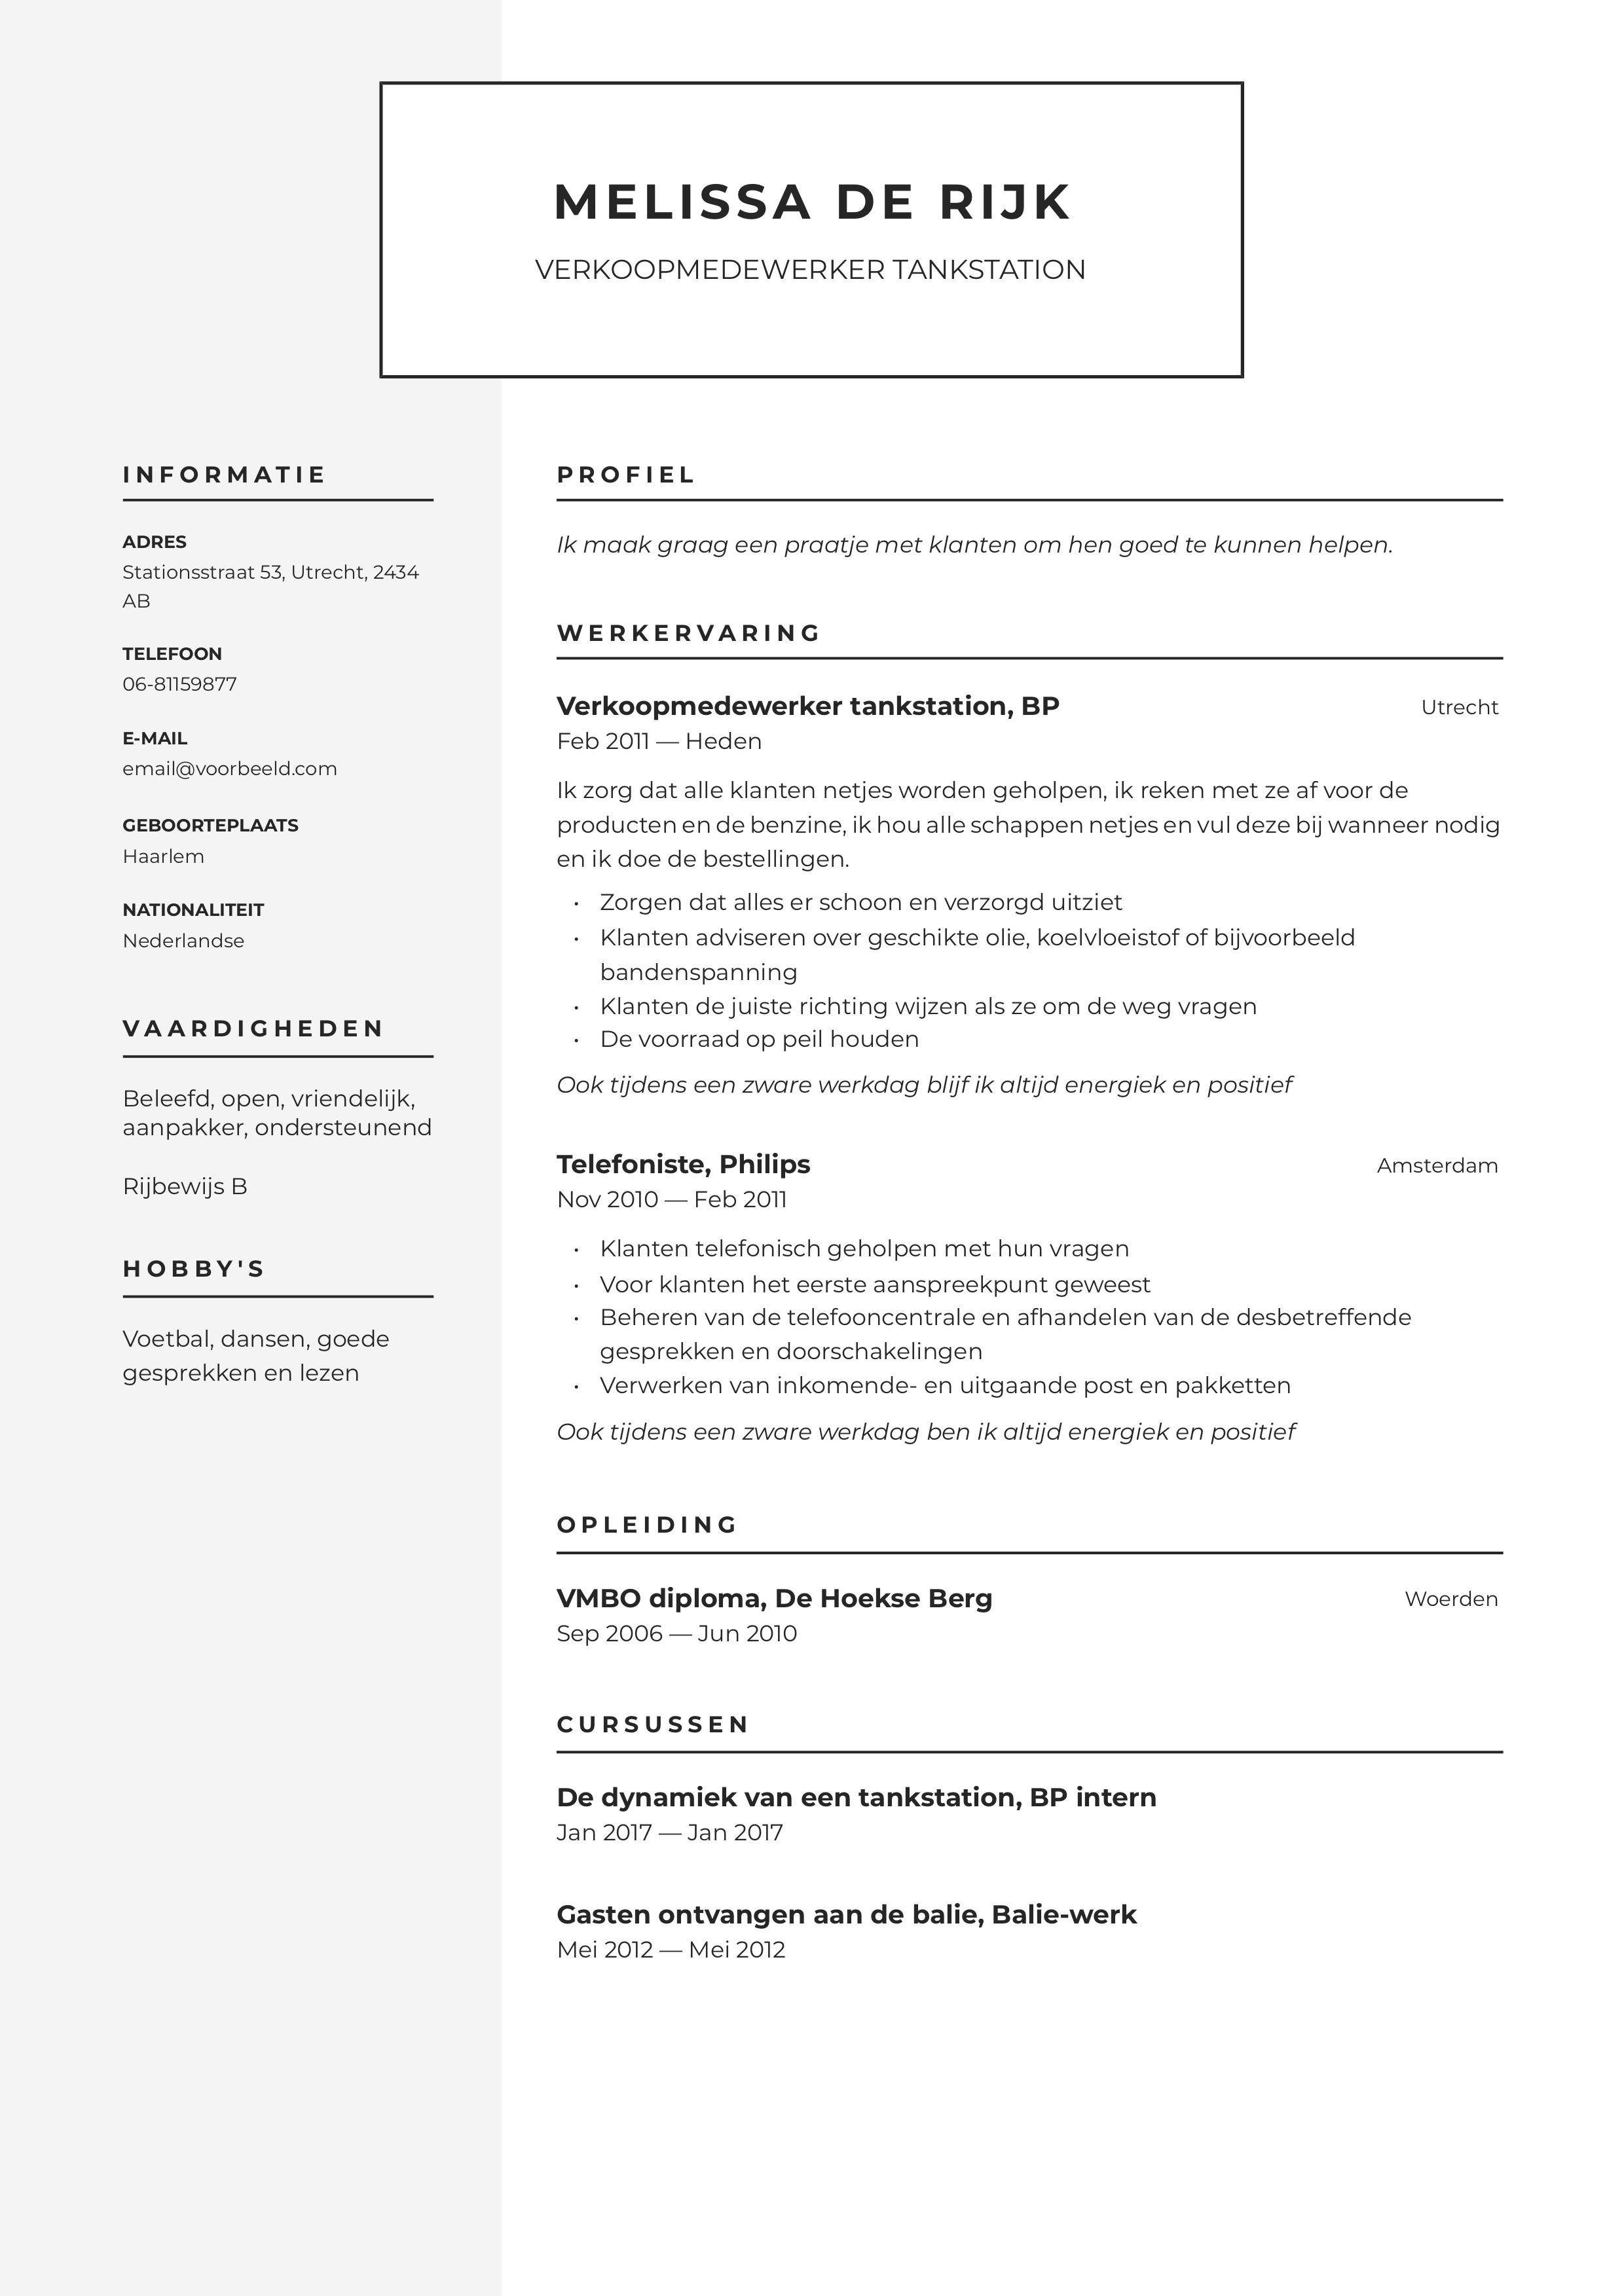 CV Verkoopmedewerker Tankstation